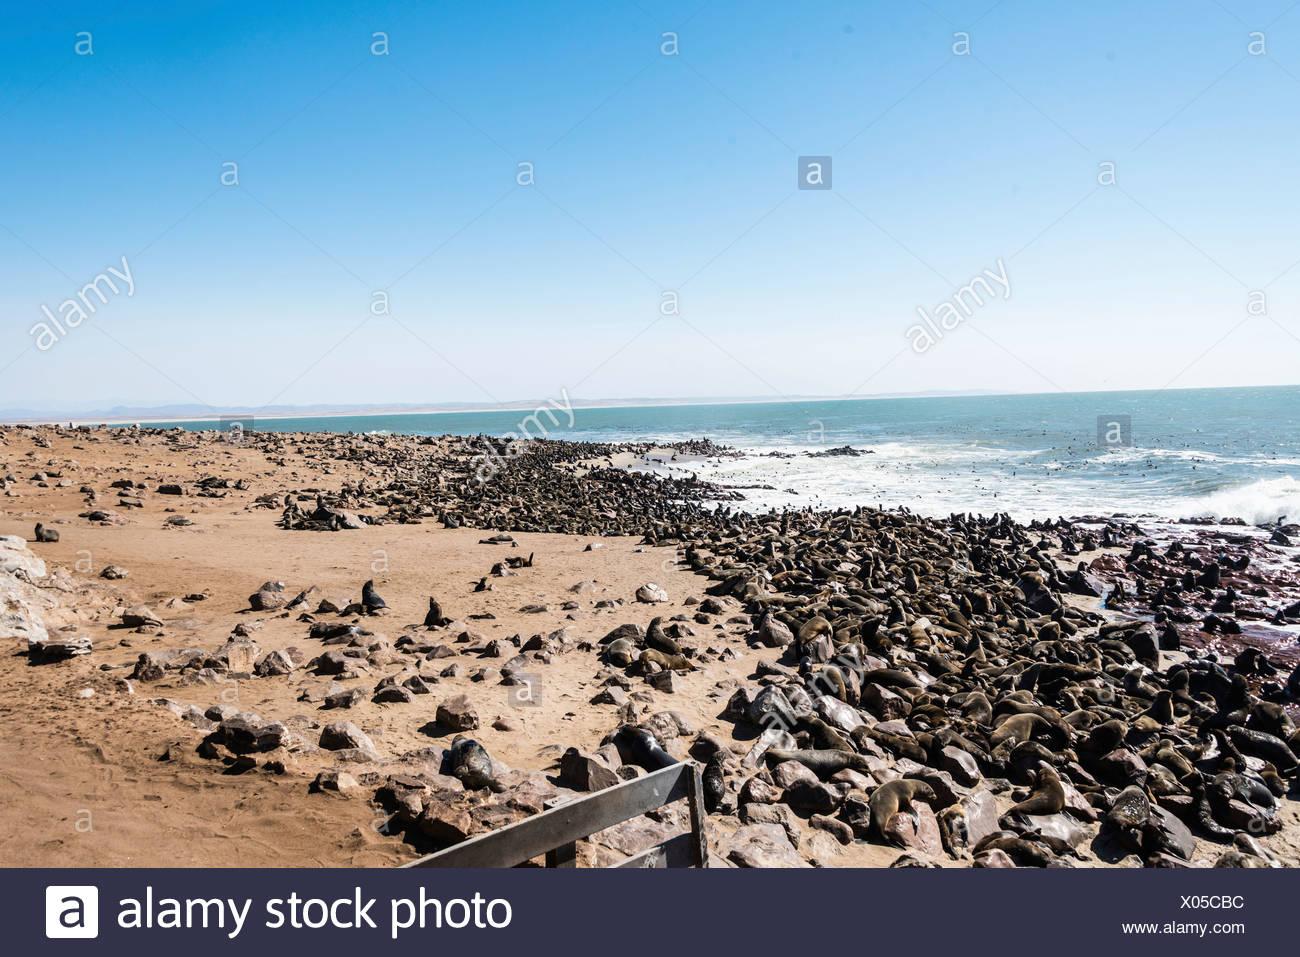 Colony of Brown Fur Seals or Cape Fur Seals (Arctocephalus pusillus), Dorob National Park, Cape Cross, Namibia - Stock Image